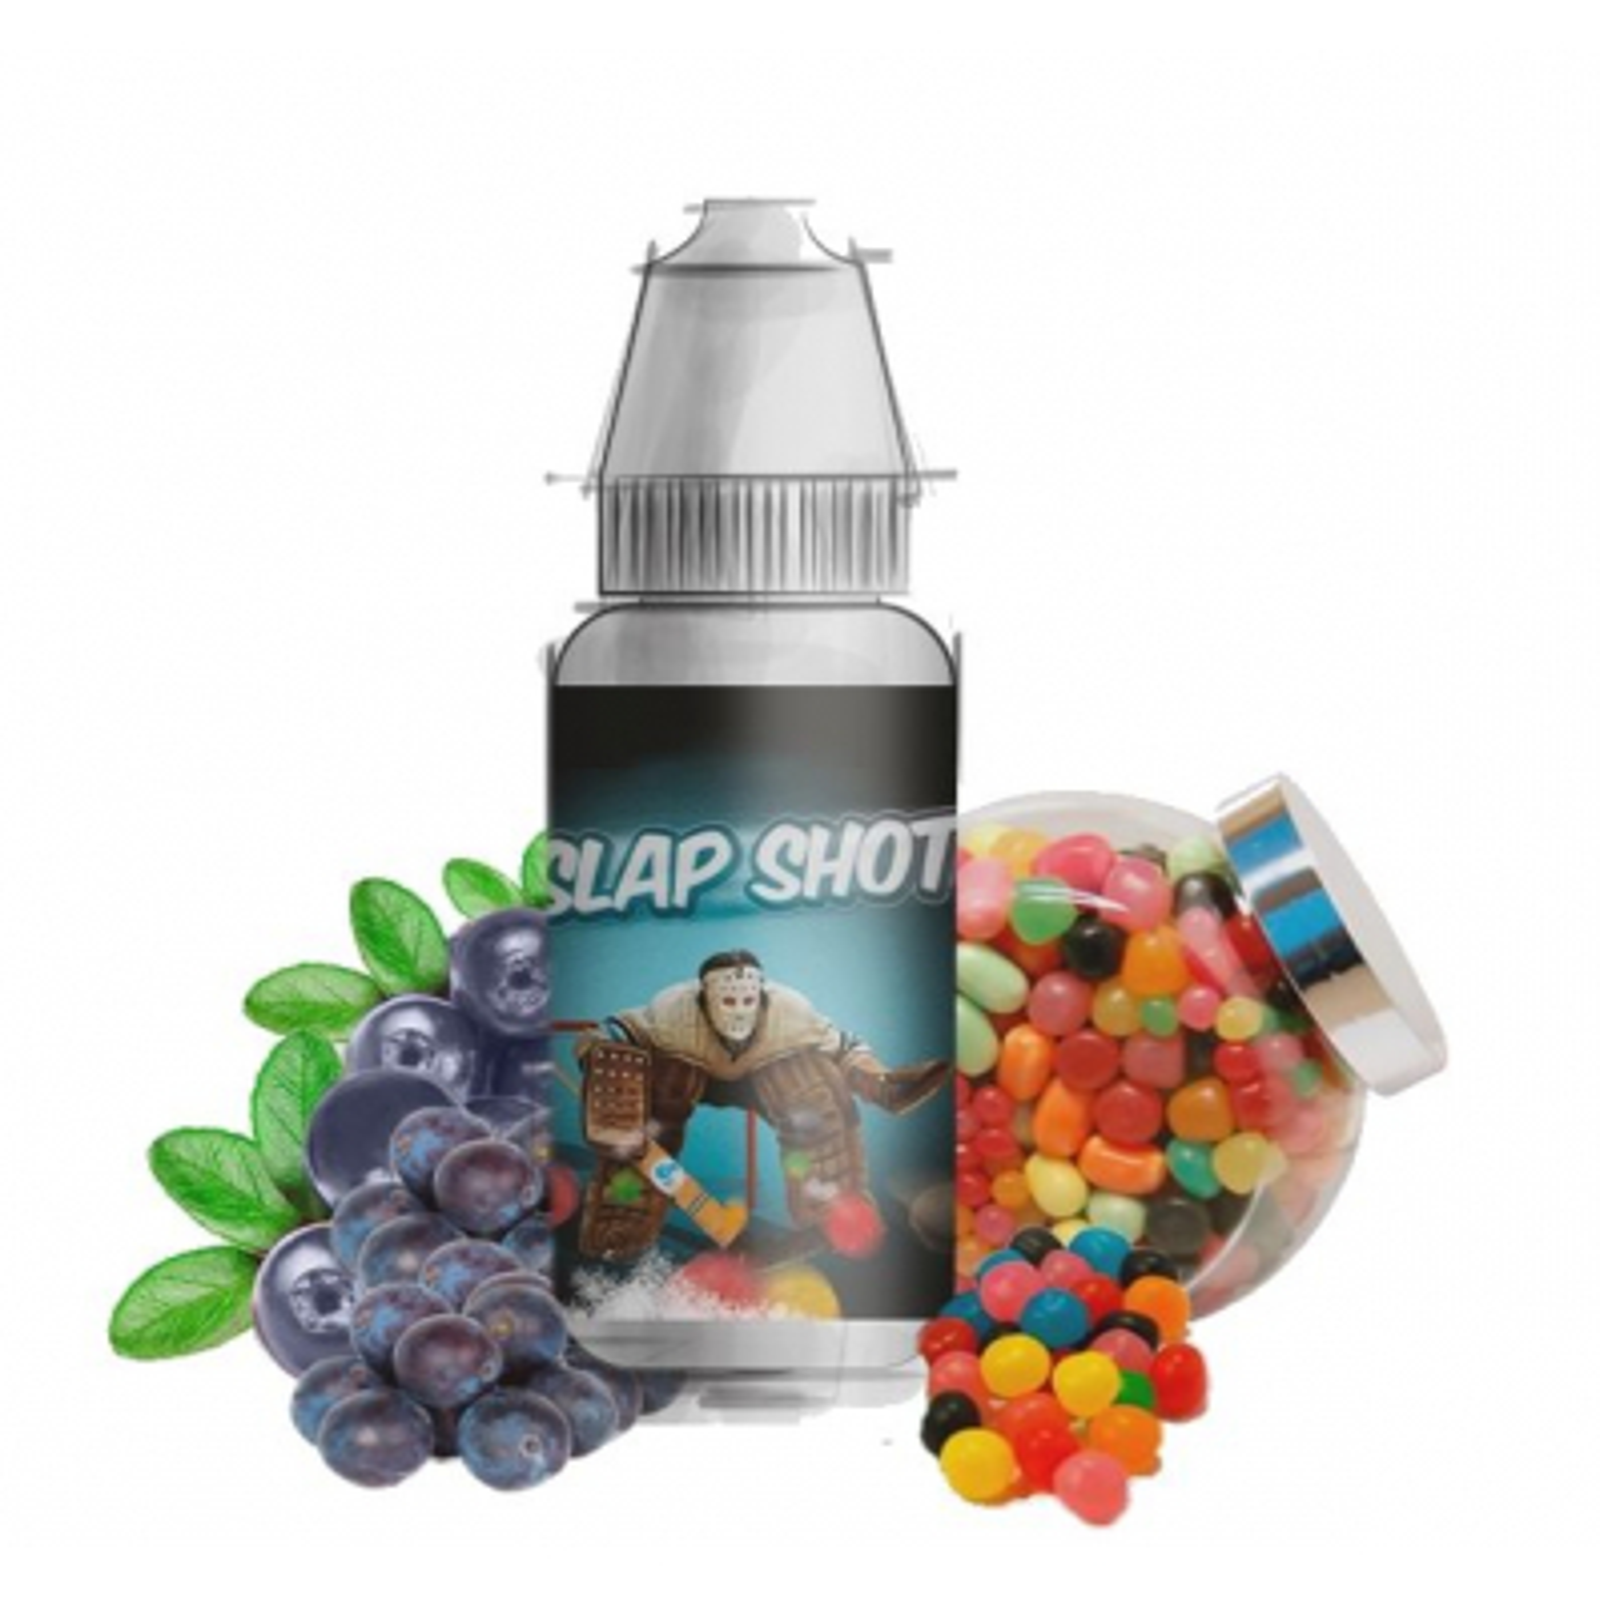 Slap Shot [Premium] - BORDO 2